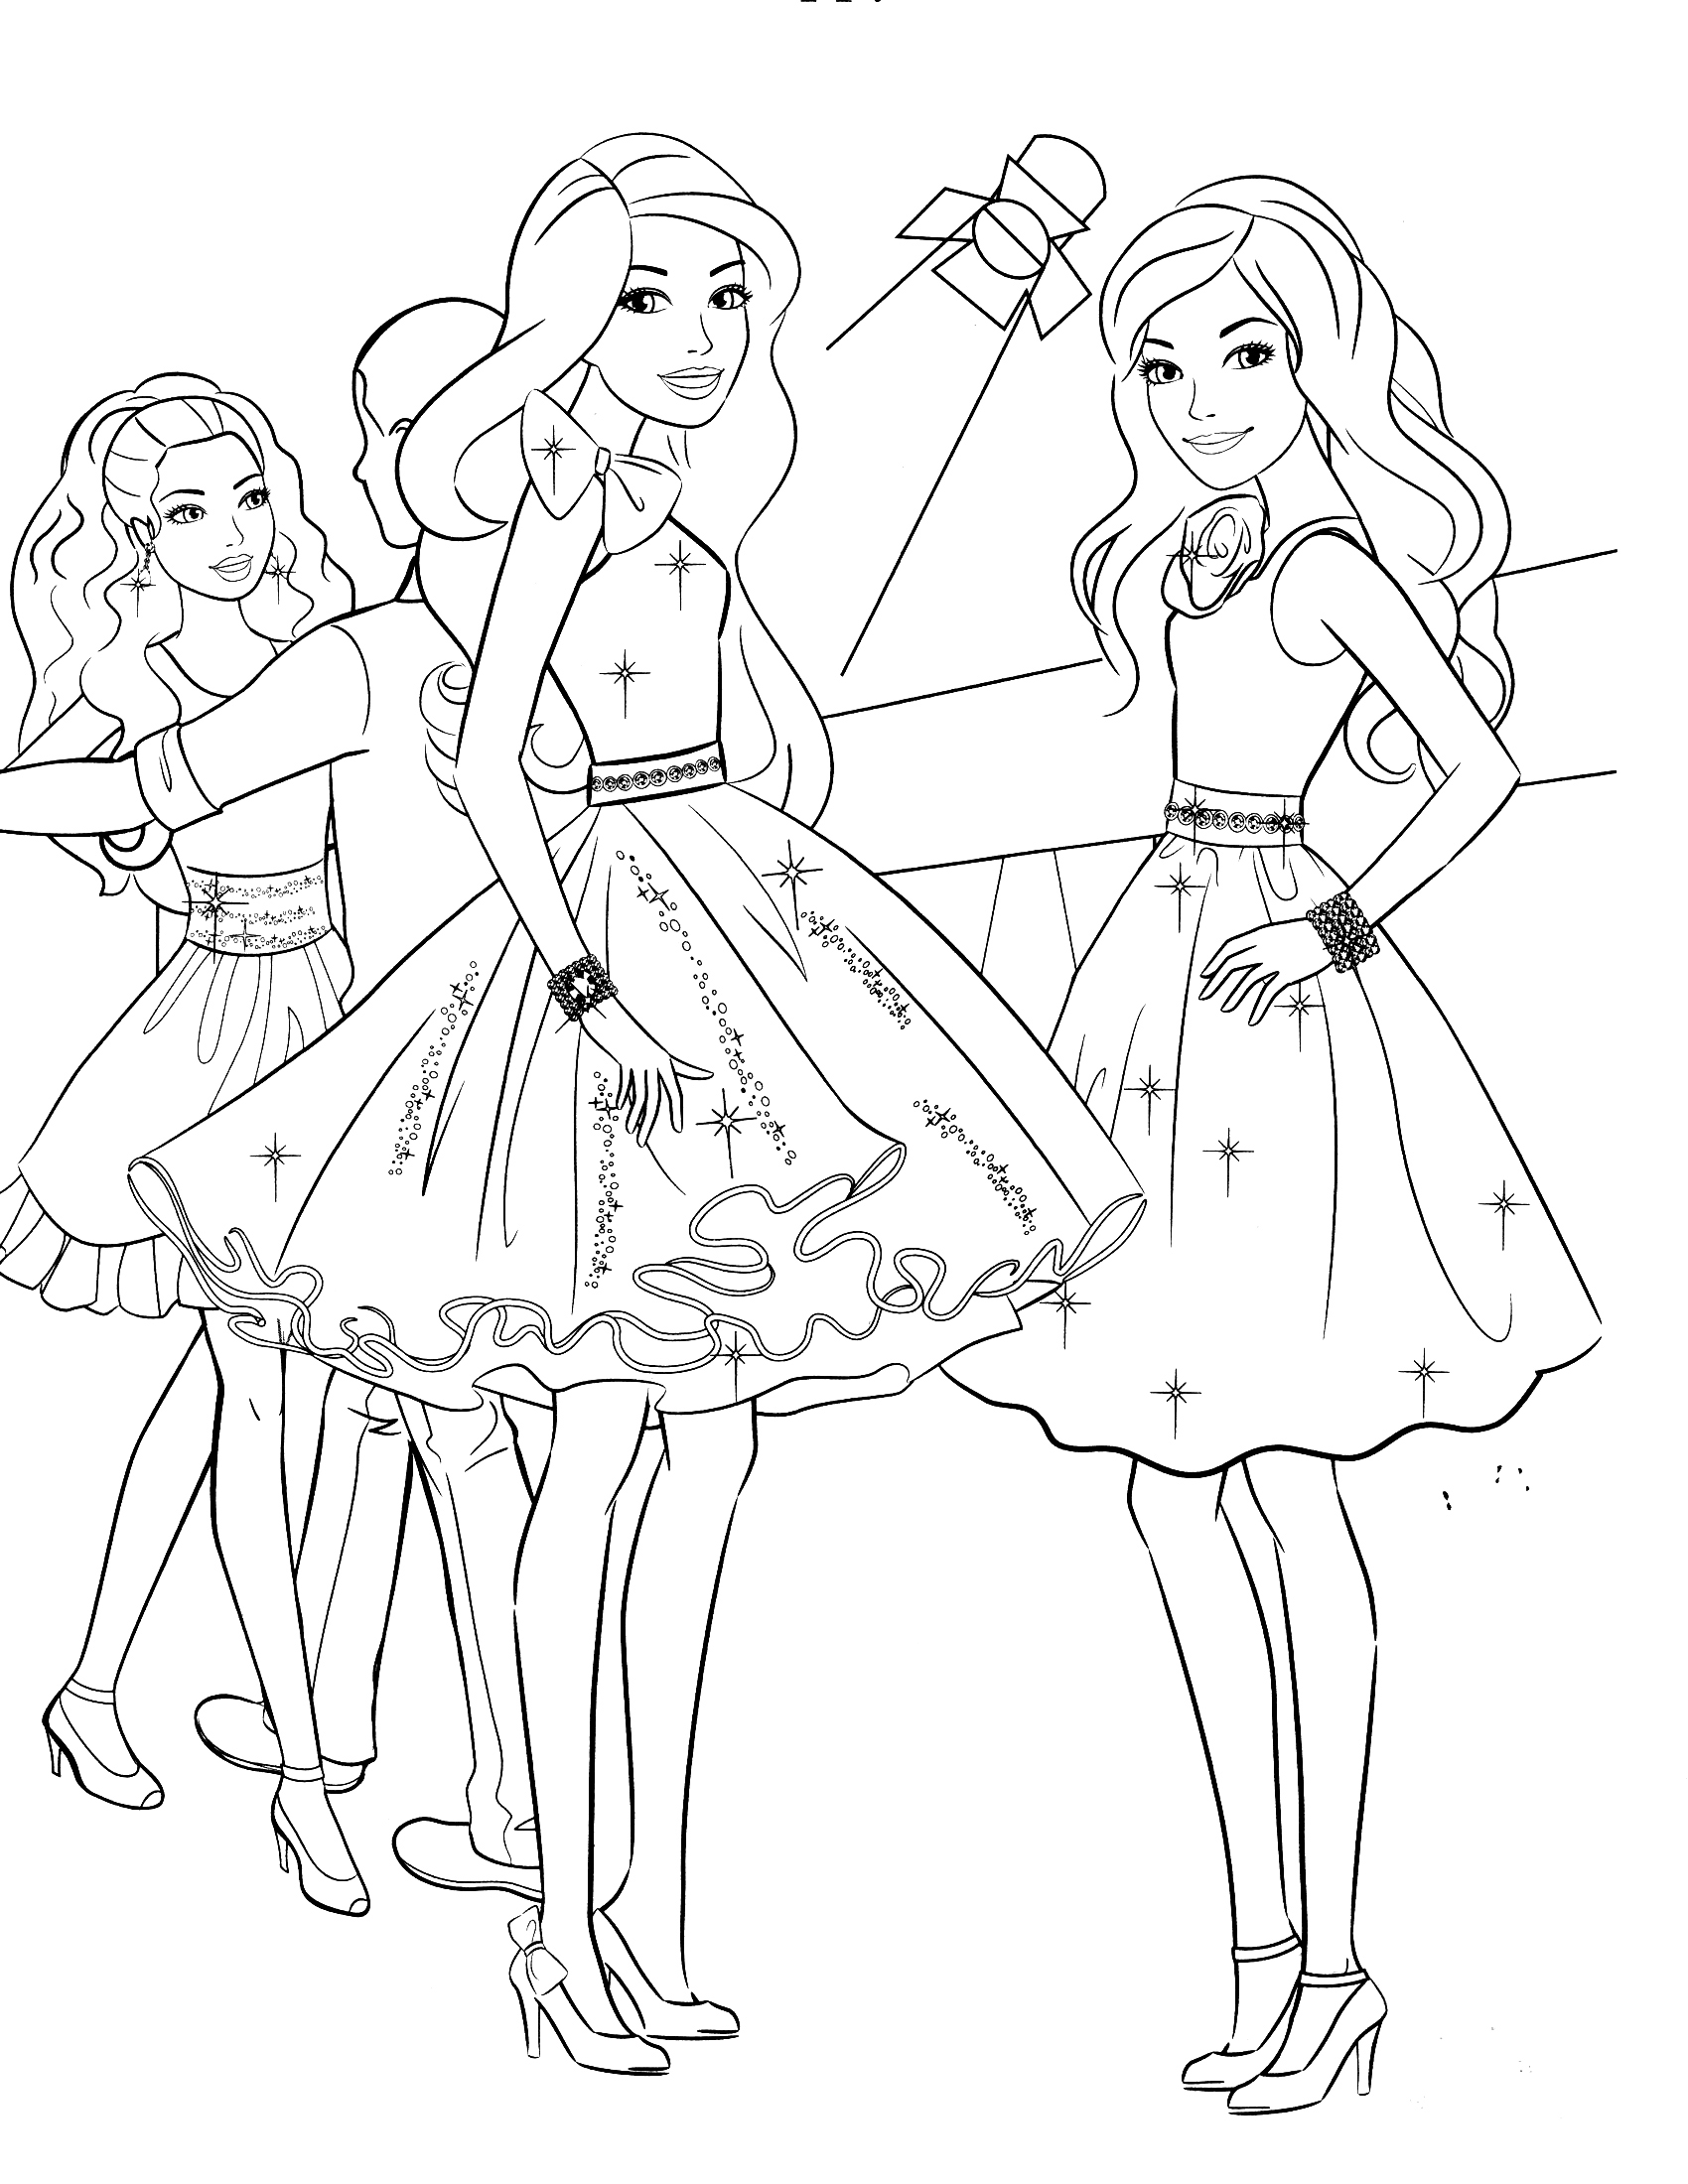 Barbie clipart colouring page fashion fairytale Fashion pages friends Pages Barbie